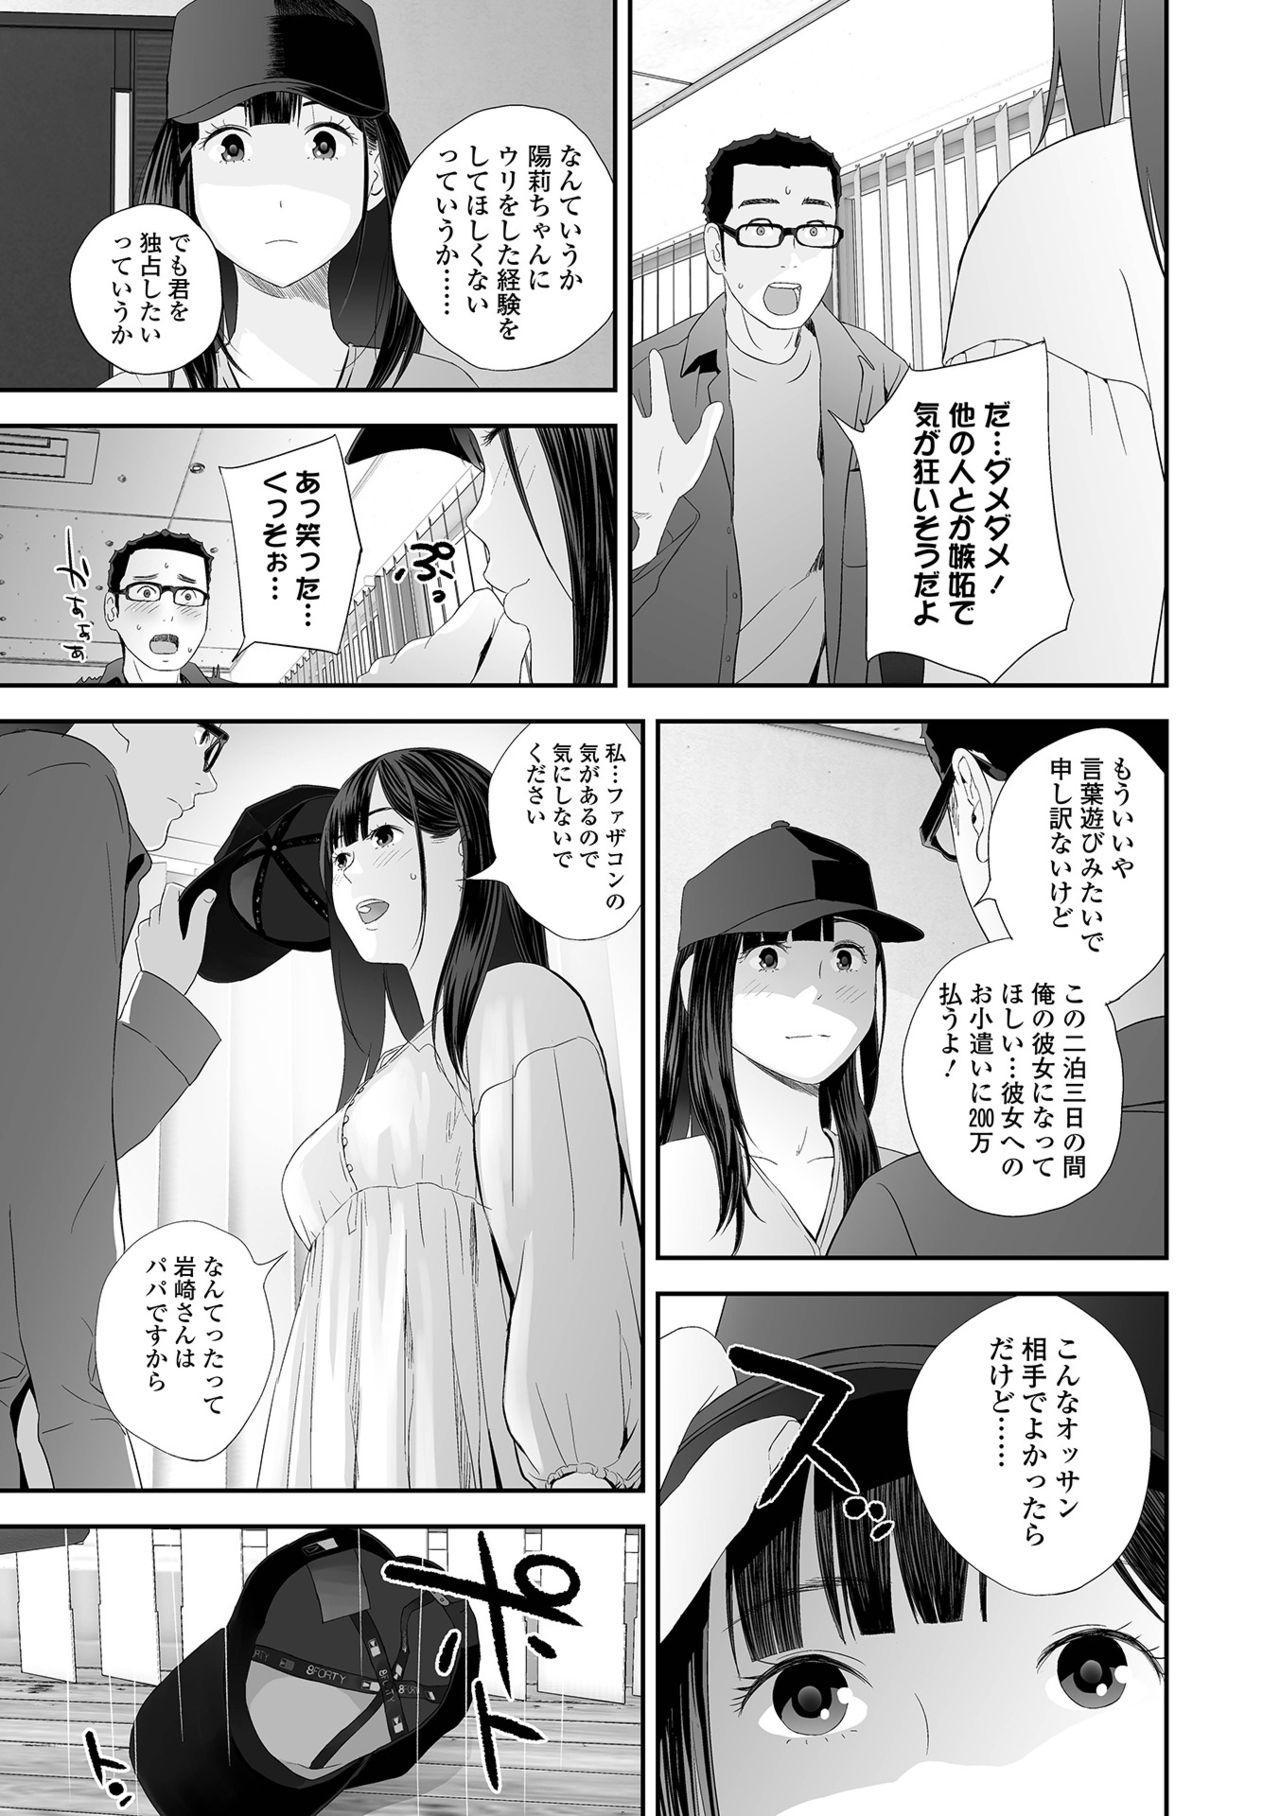 COMIC Shigekiteki SQUIRT!! Vol. 25 52